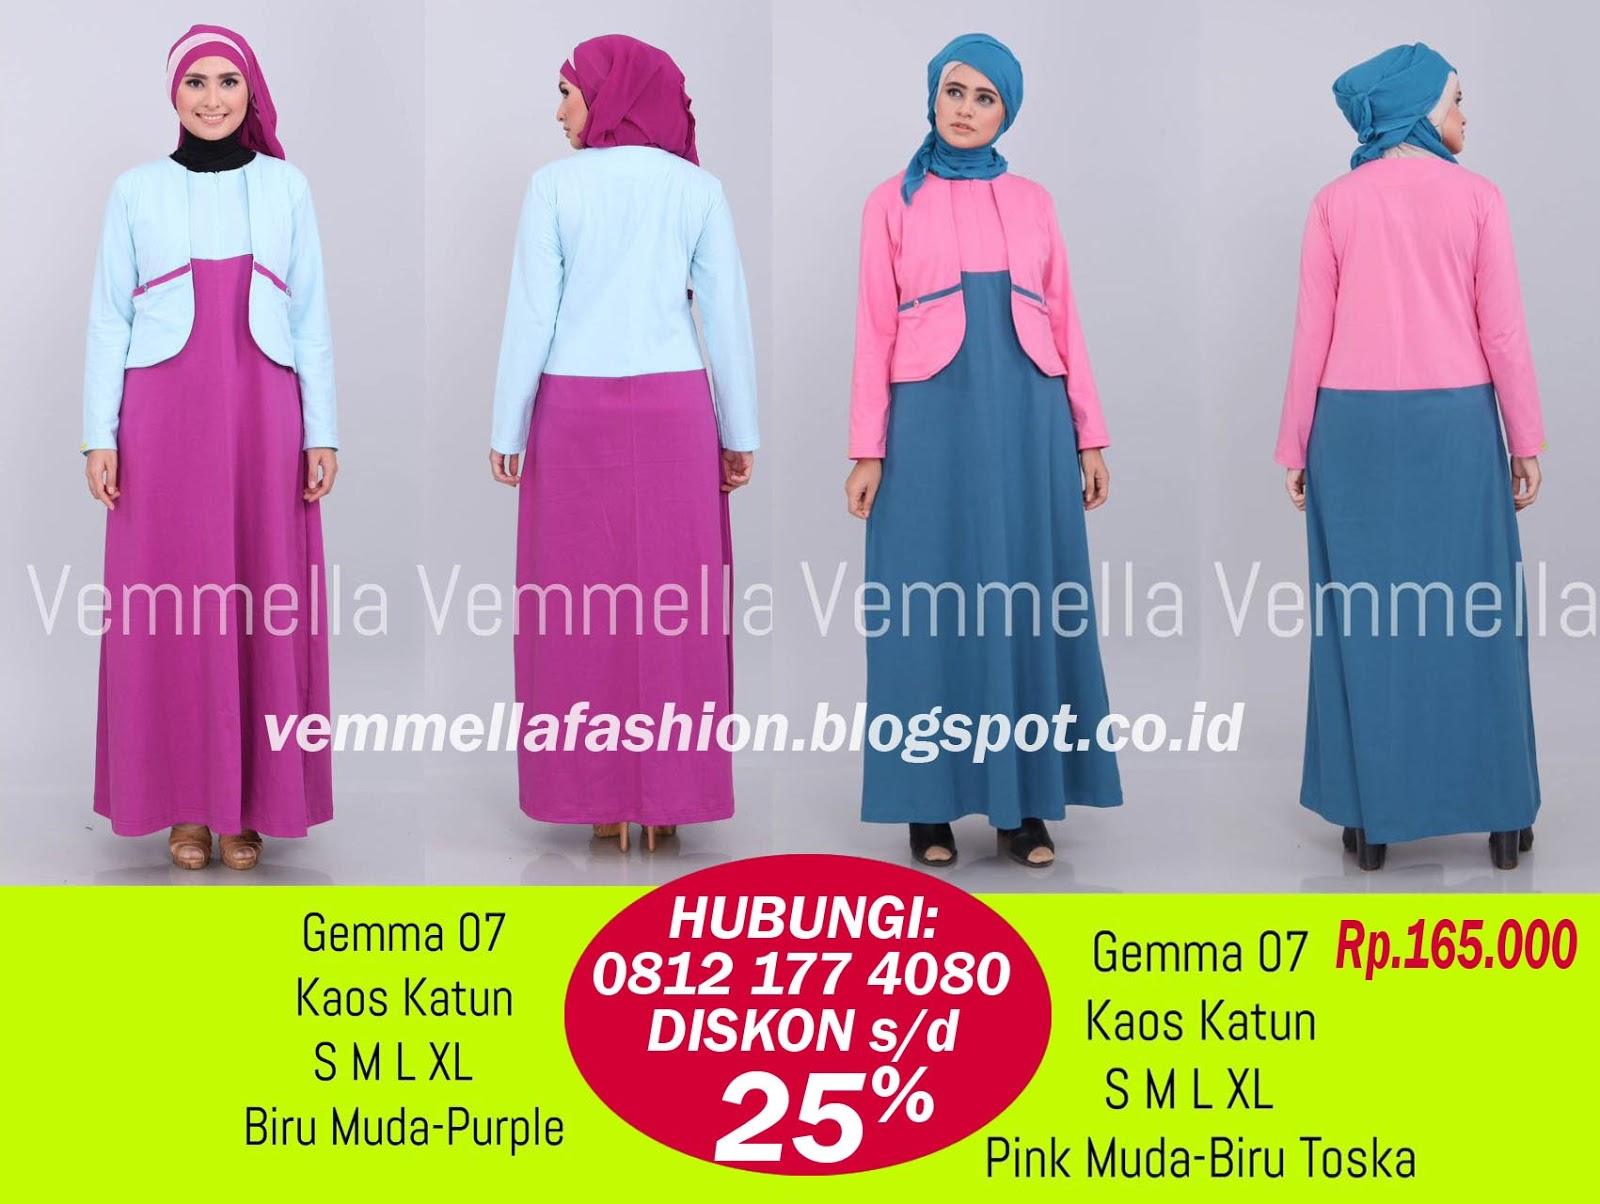 Katalog Vemmella Baju Kaos Gamis Atasan 0856 4864 8202